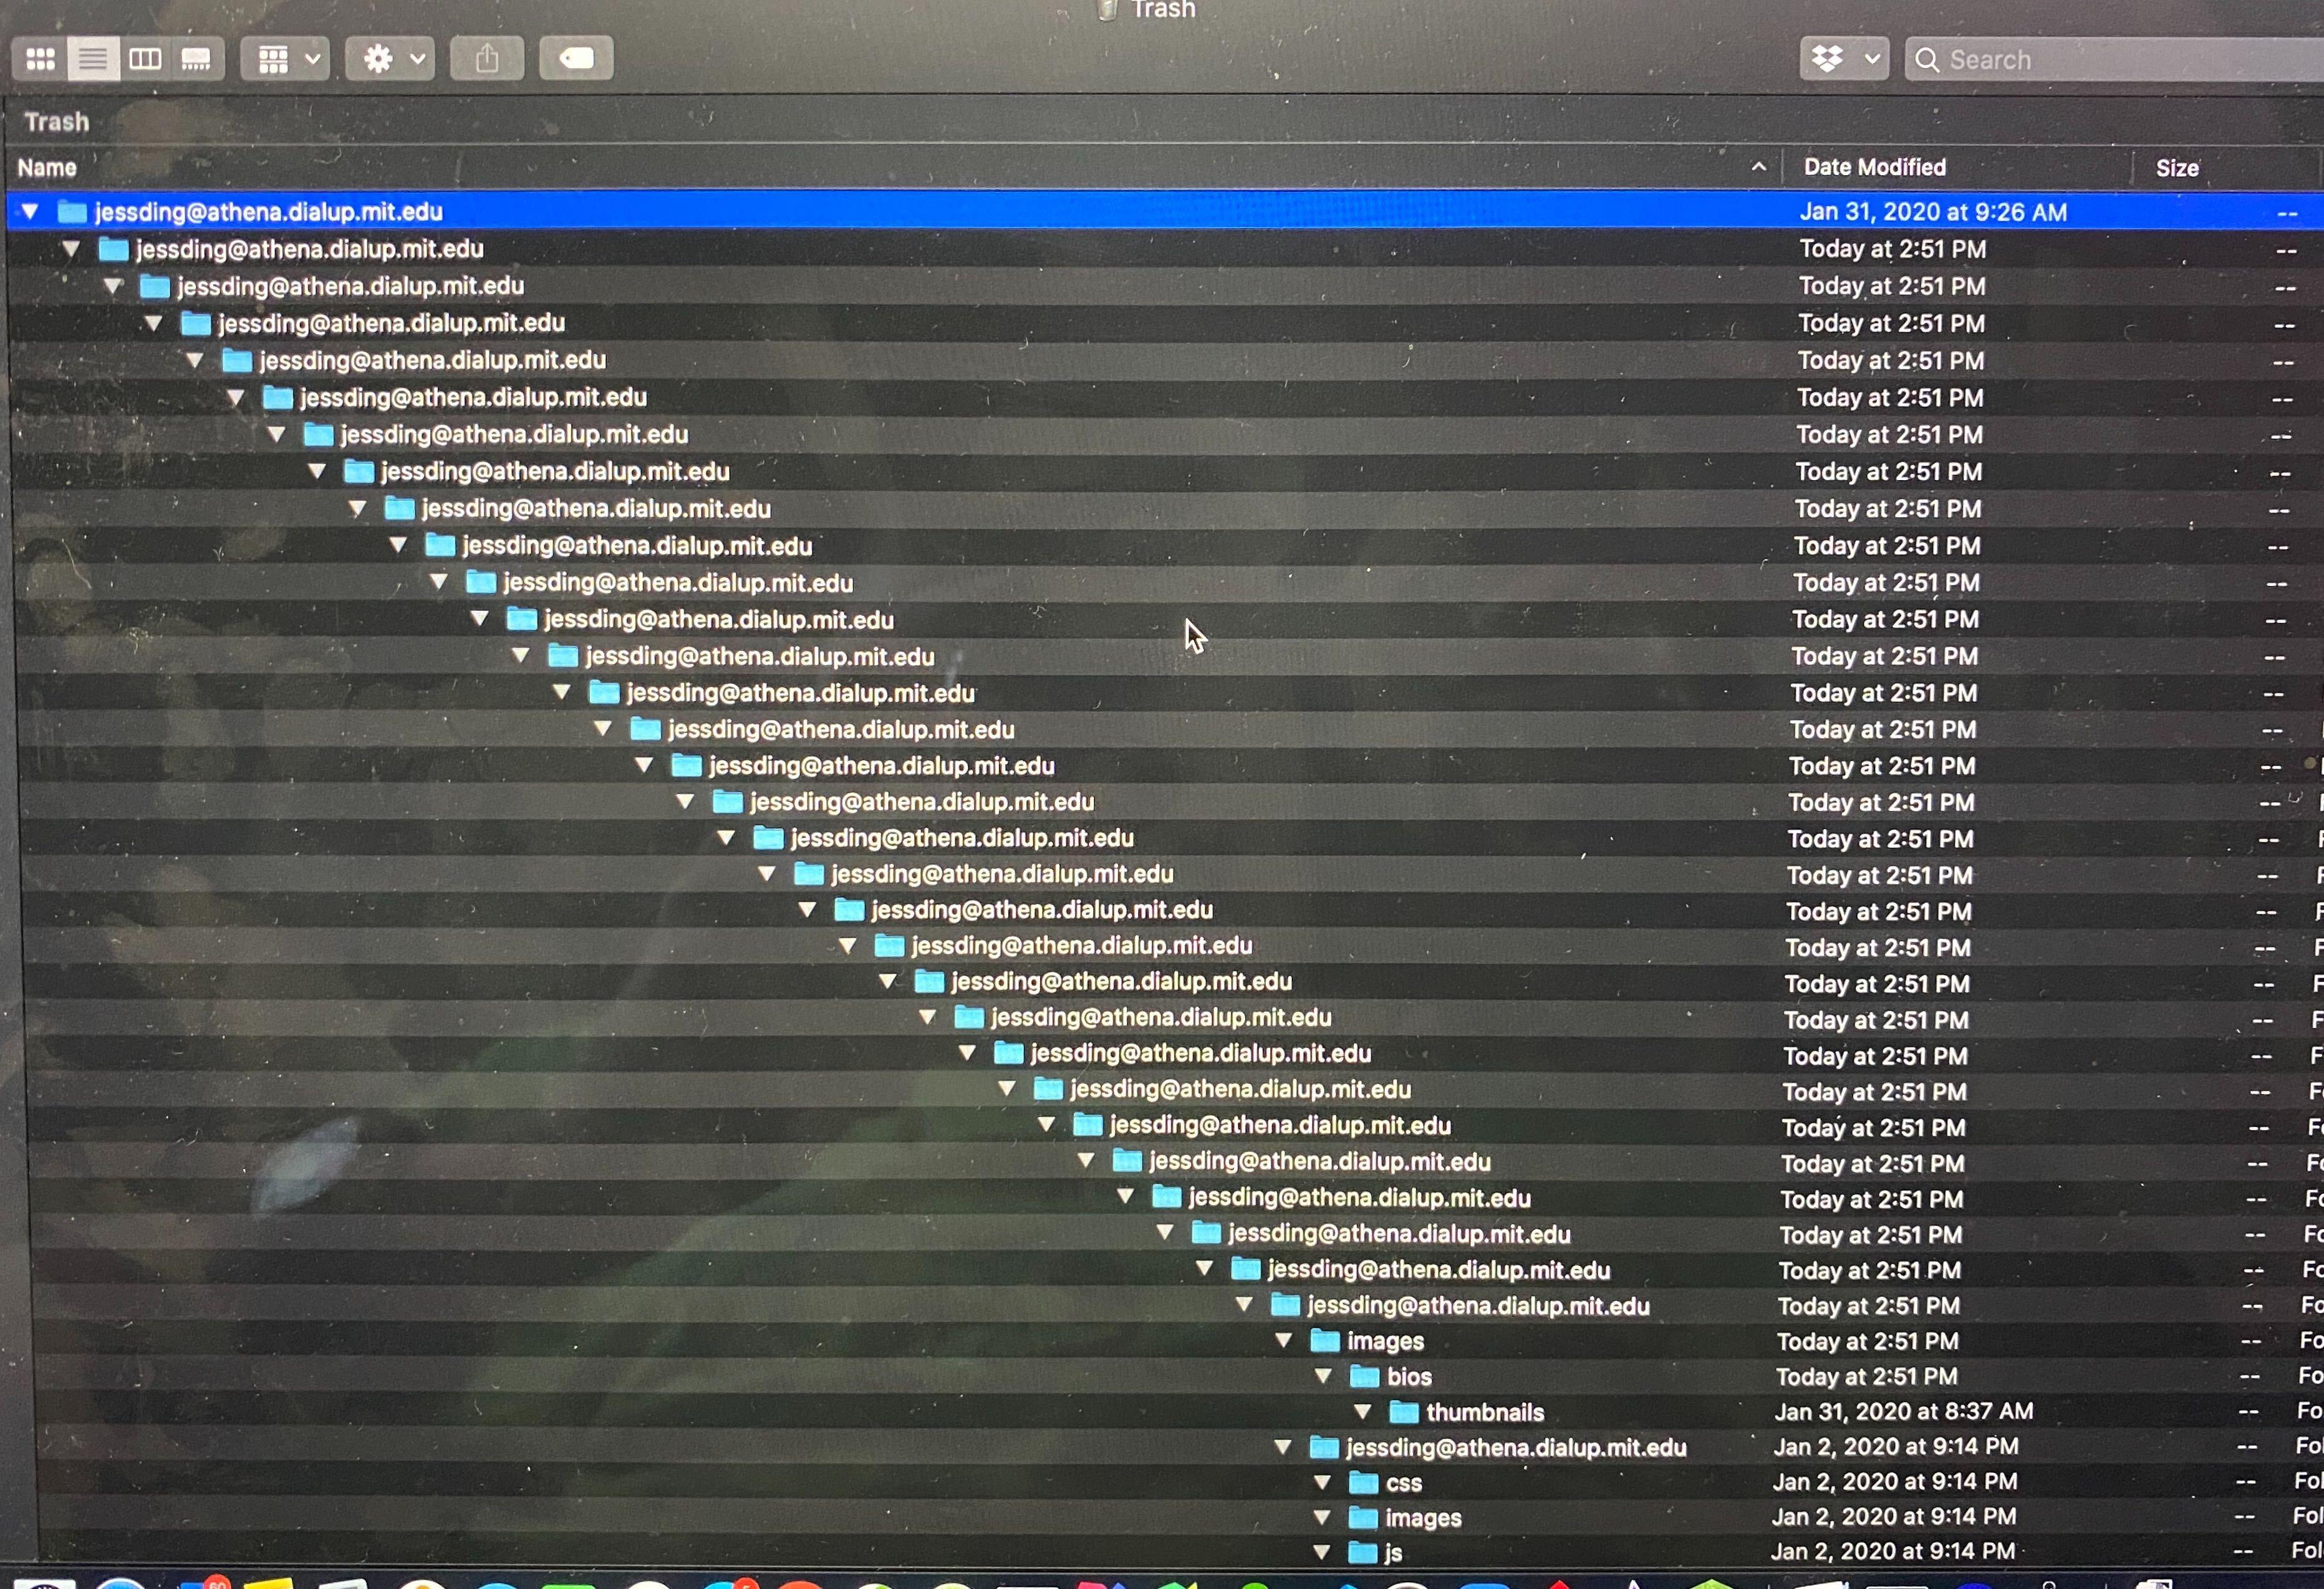 https://cloud-ibzvvve2x.vercel.app/0image_from_ios.jpg